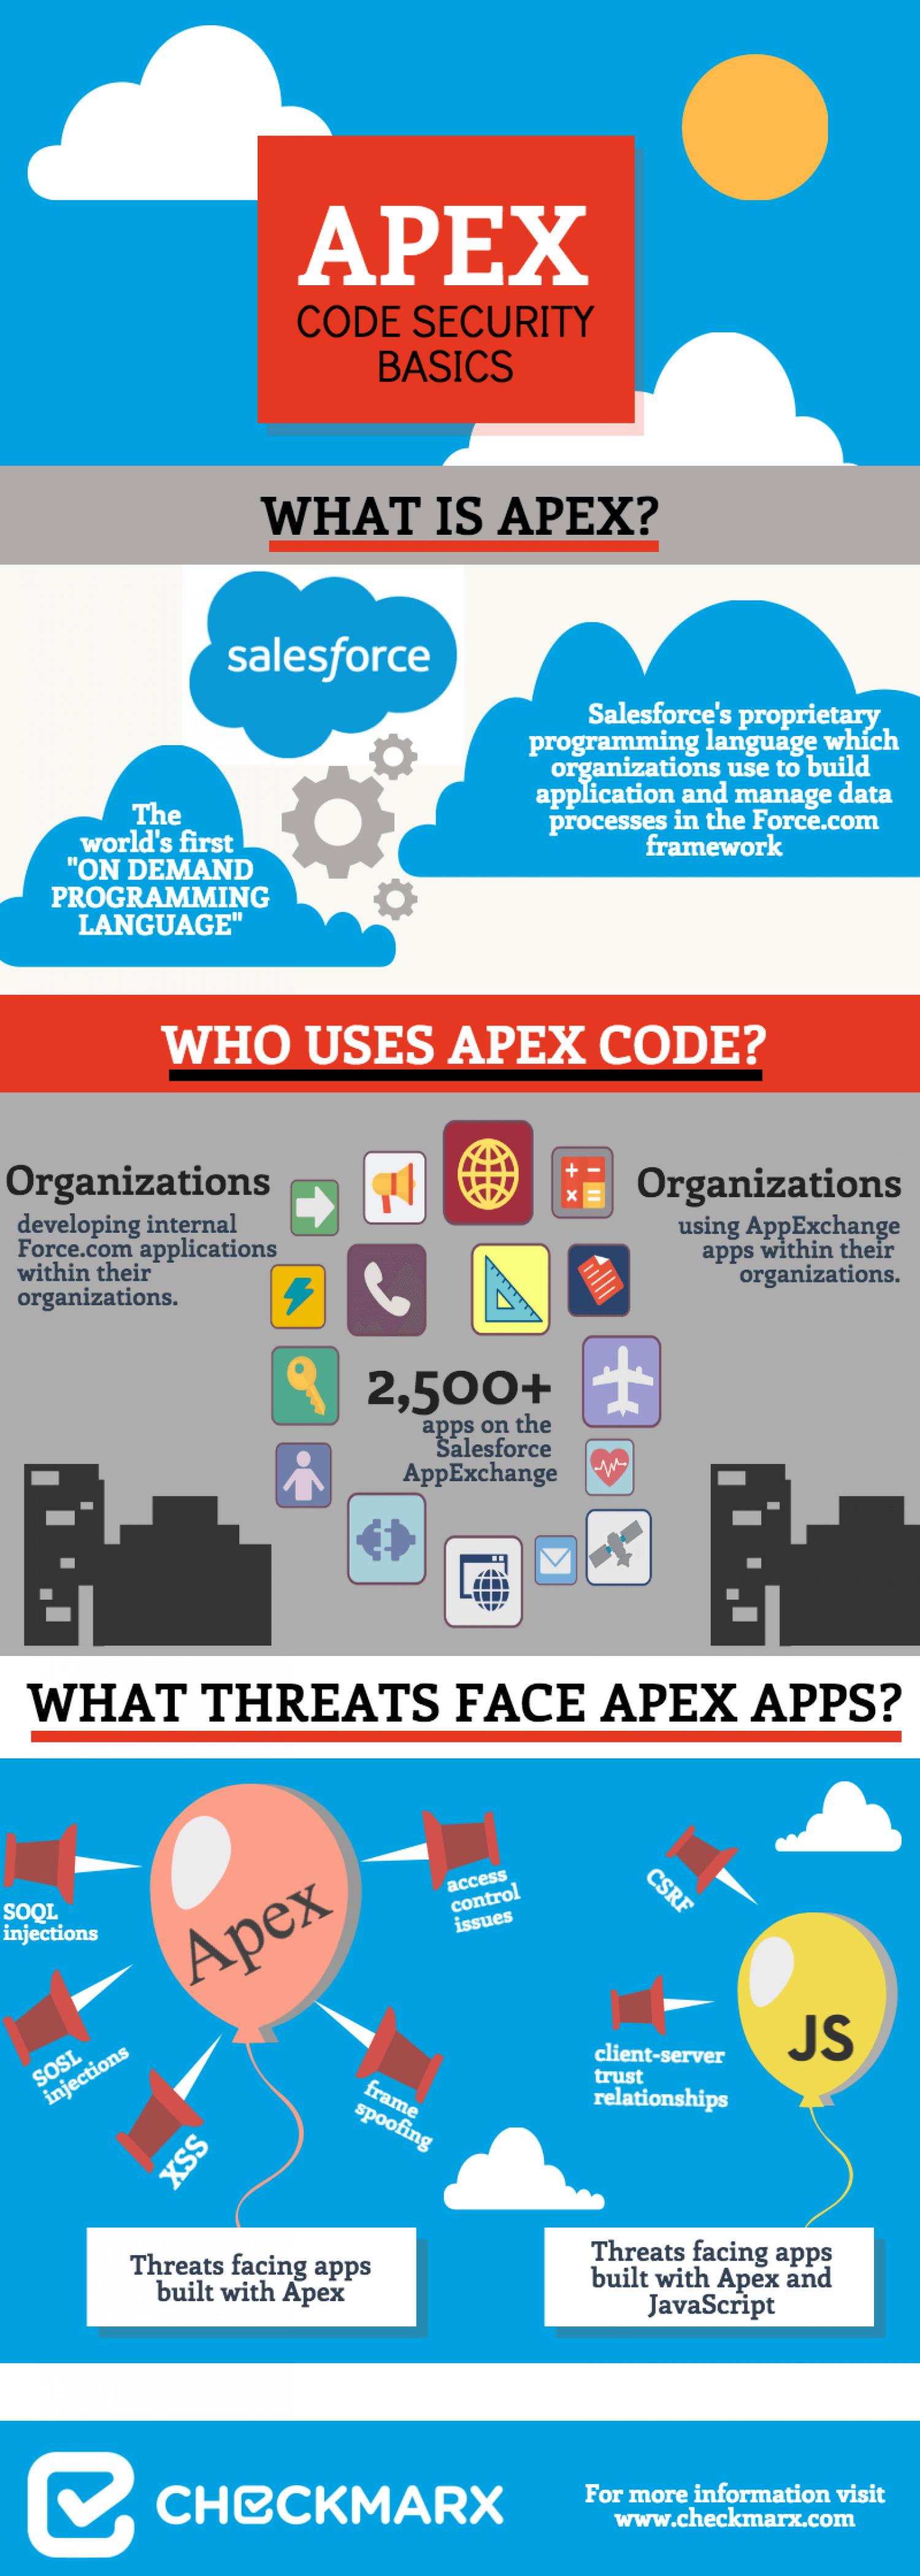 ABC's of Salesforce's Apex Coding Language